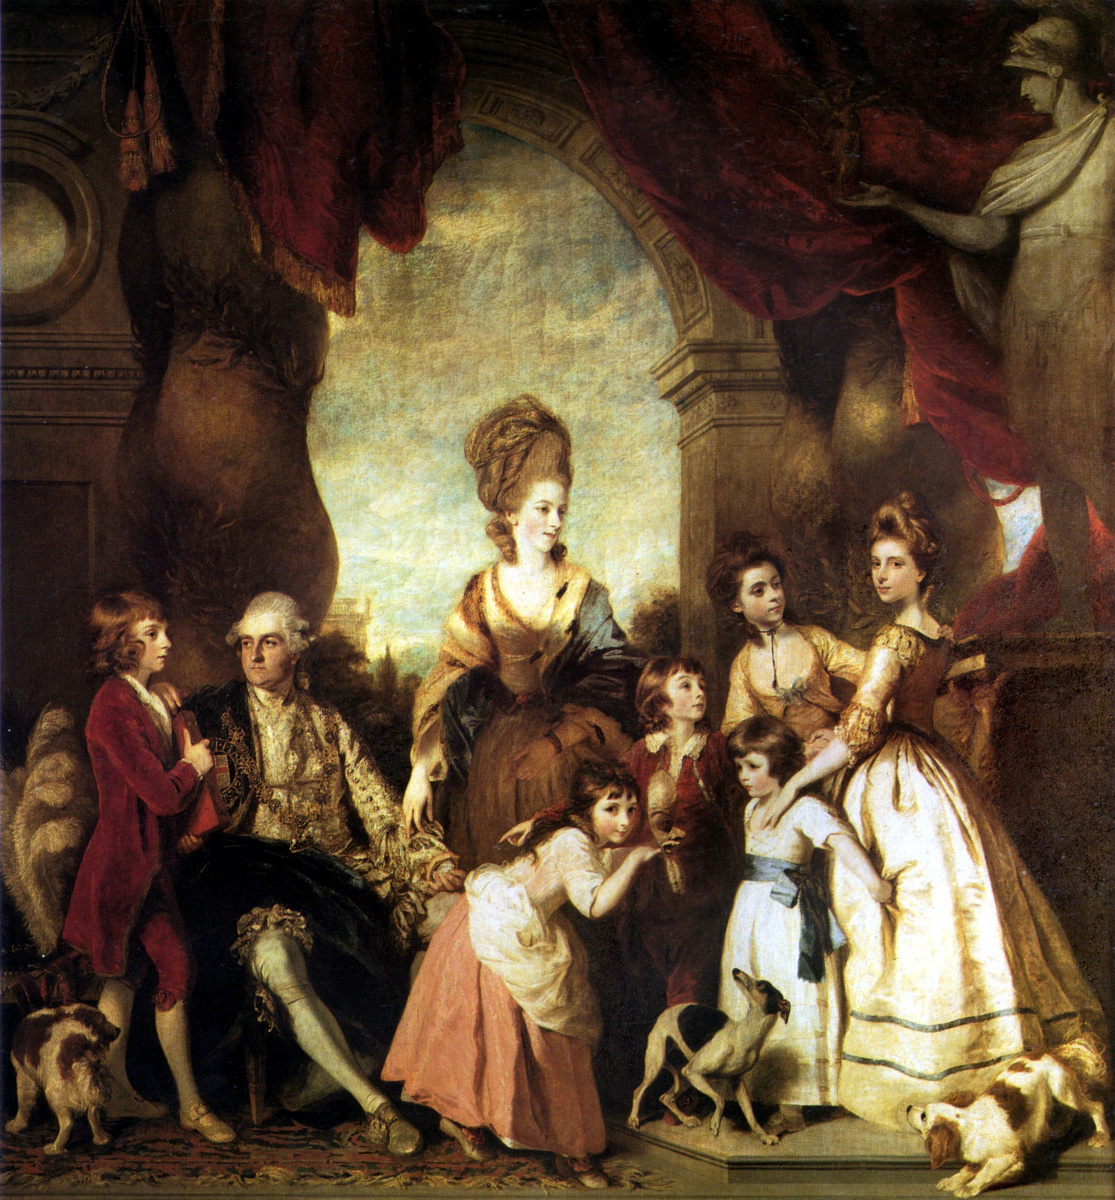 Joshua Reynolds. The Fourth Duke of Marlborough with the family